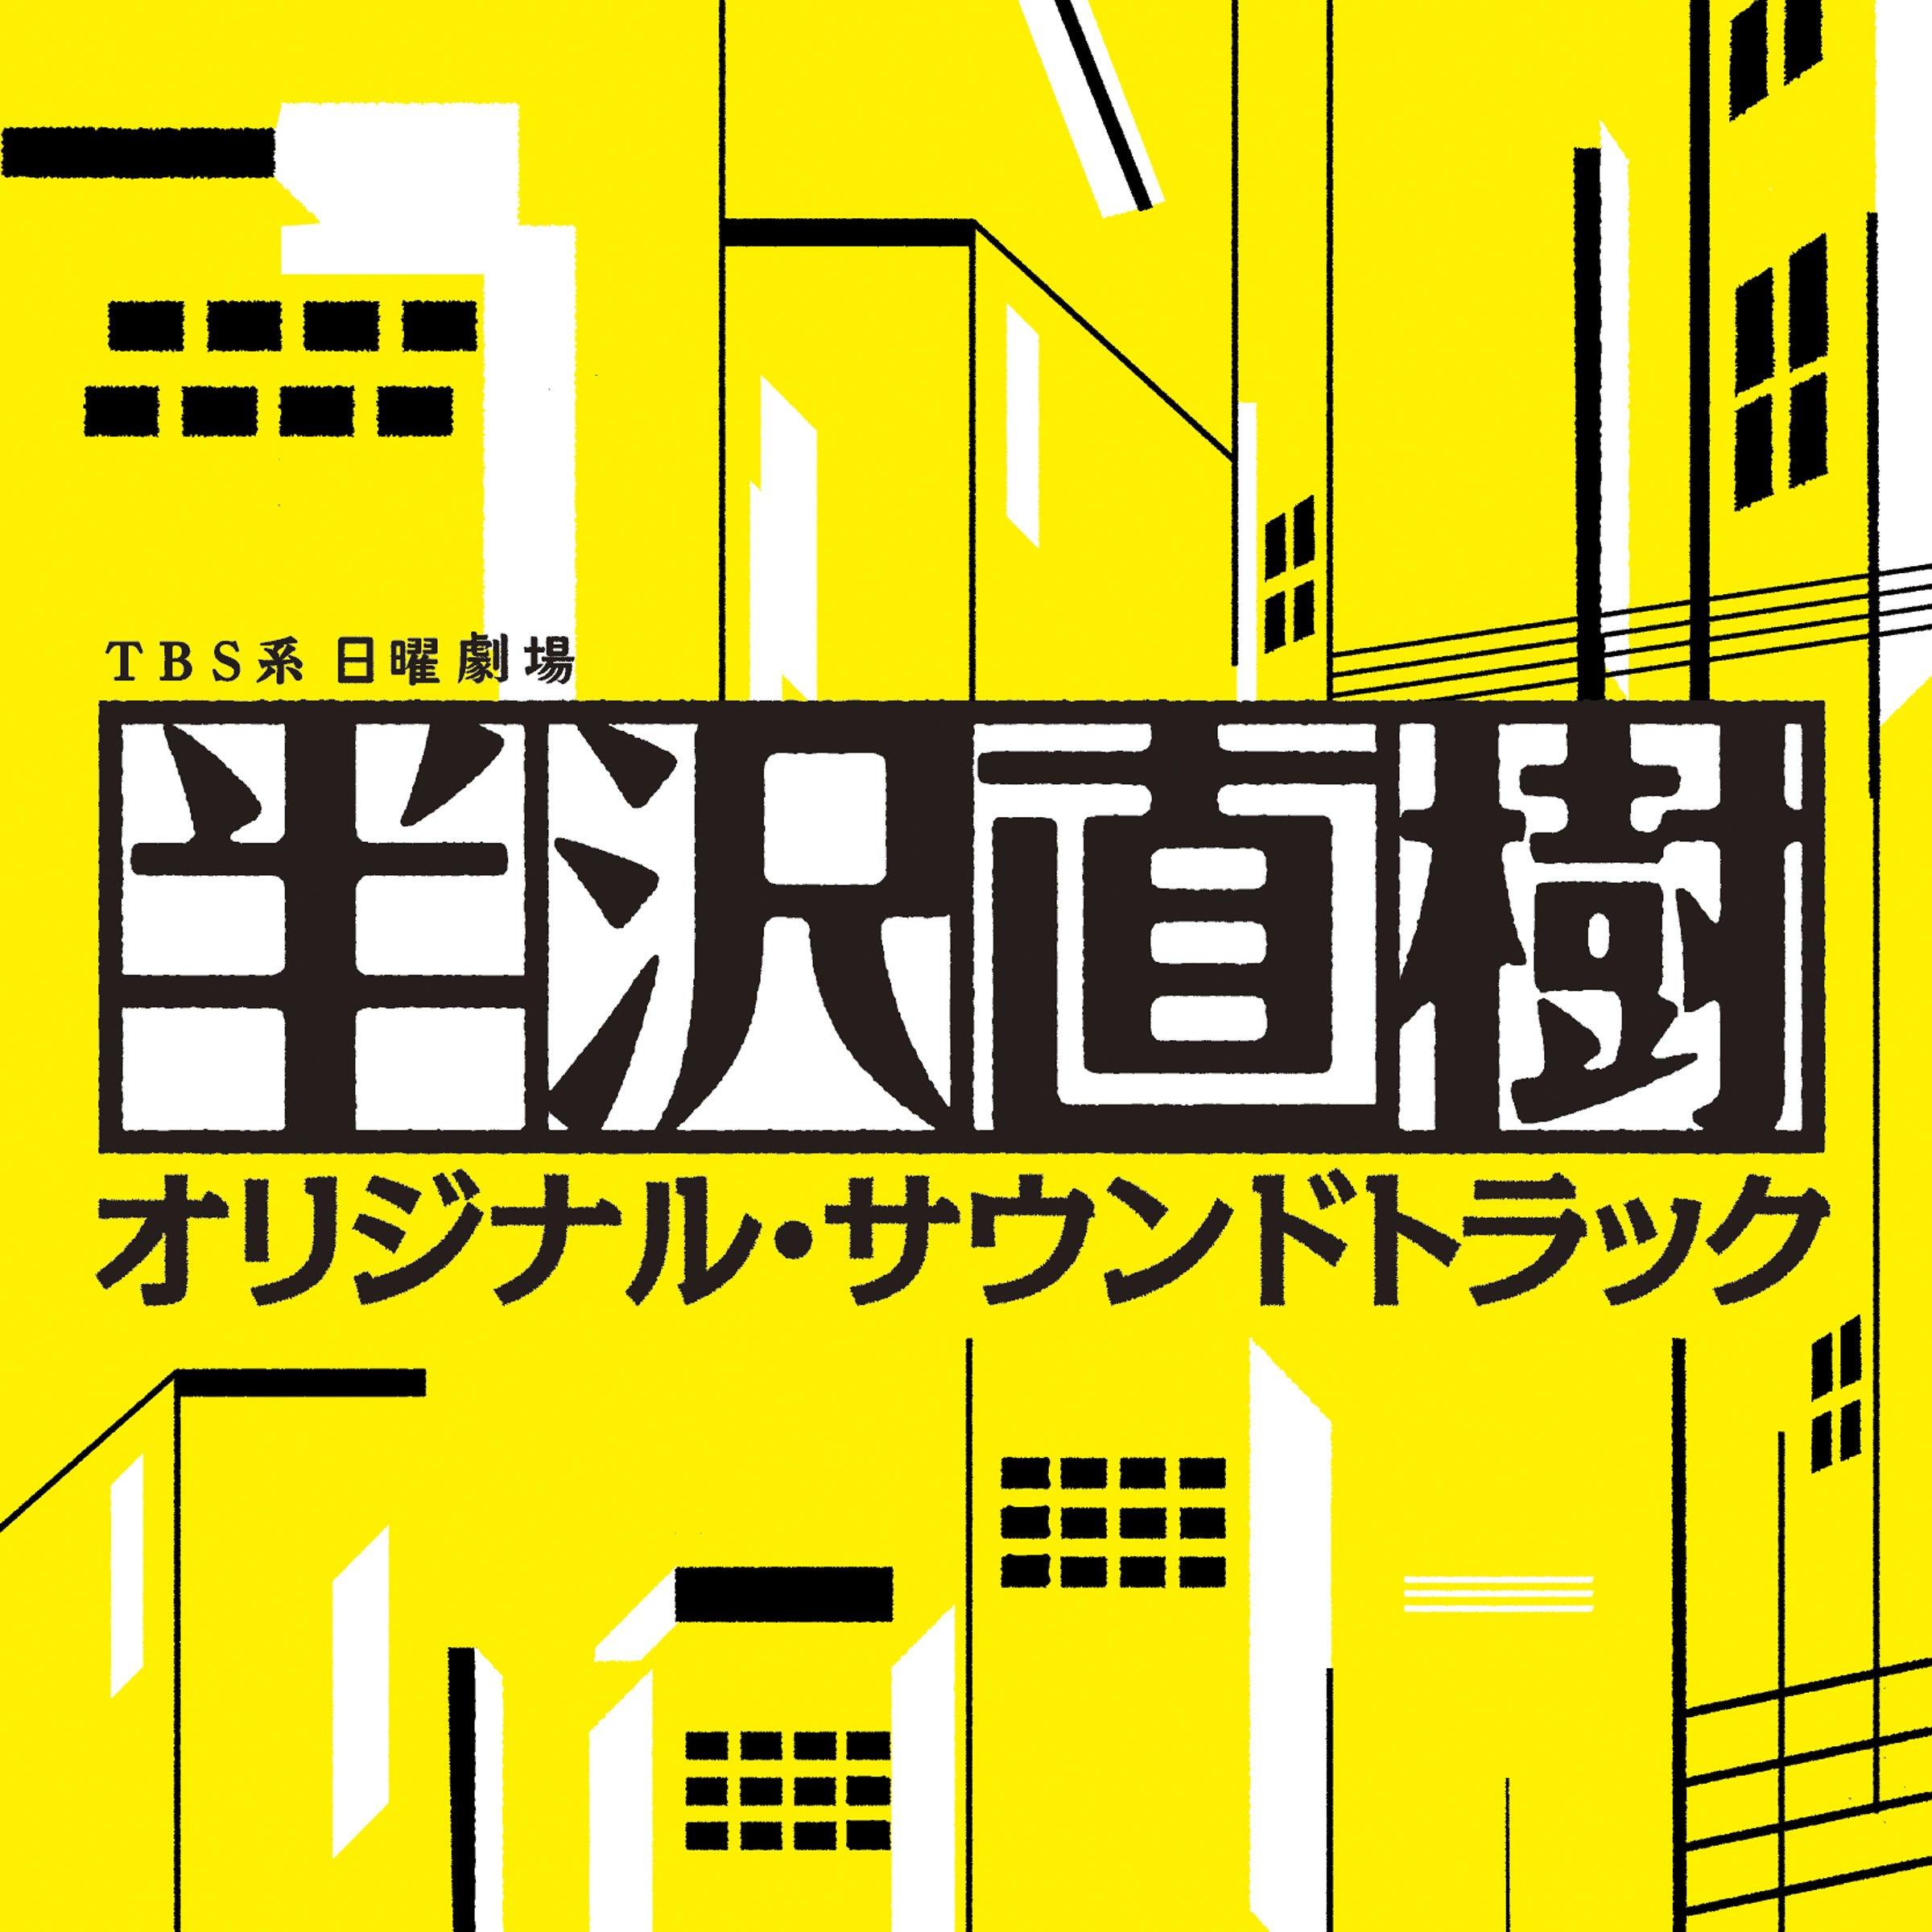 [Album] 服部隆之 (Takayuki Hattori) – TBS系 日曜劇場「半沢直樹」オリジナル・サウンドトラック [FLAC / 24bit Lossless / WEB] [2013….